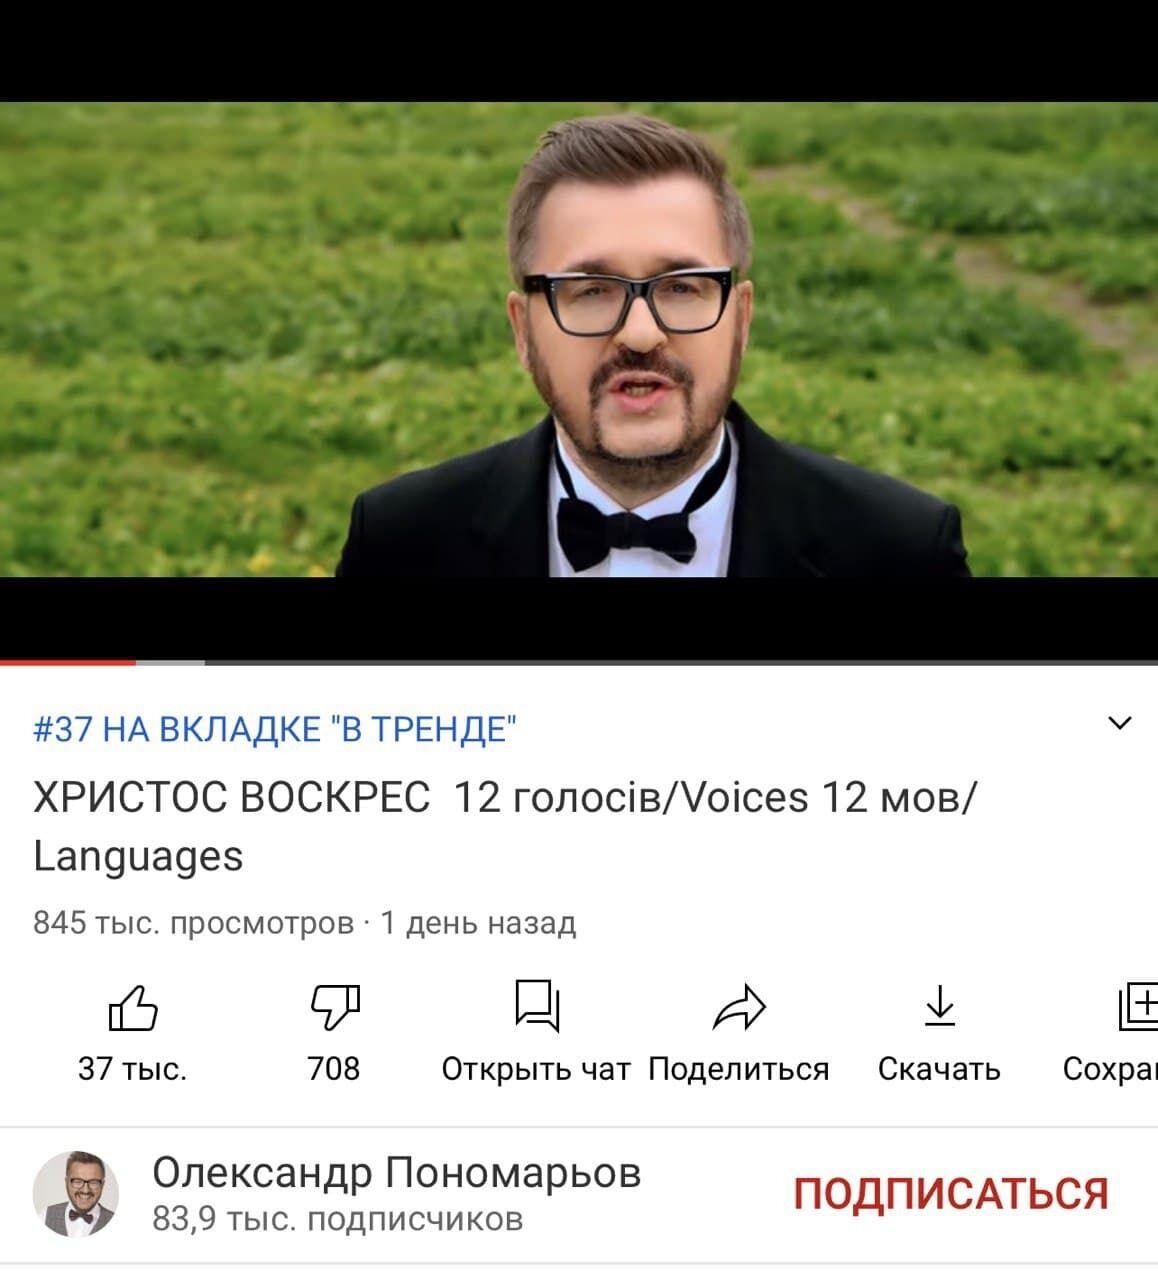 Также композиция попала на 37 место российских трендов YouTube